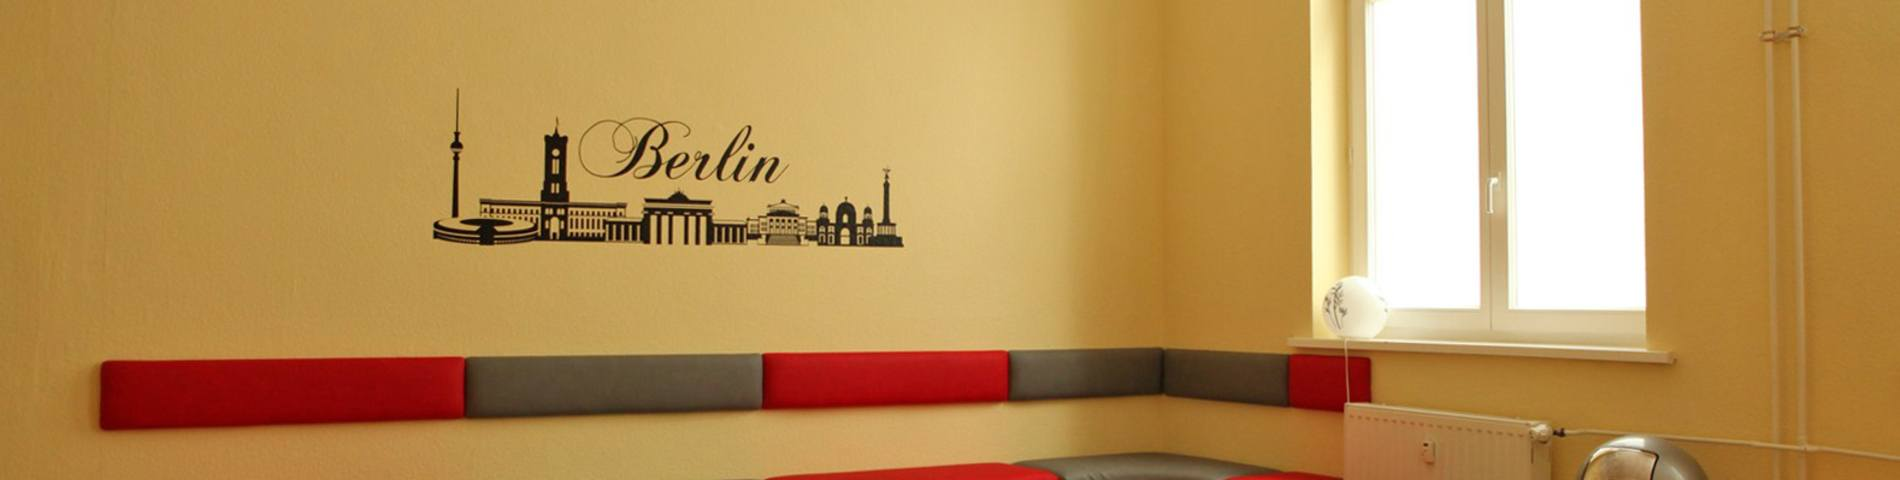 carl duisberg centrum berlin dil okulu almanya 34 de erlendirme. Black Bedroom Furniture Sets. Home Design Ideas